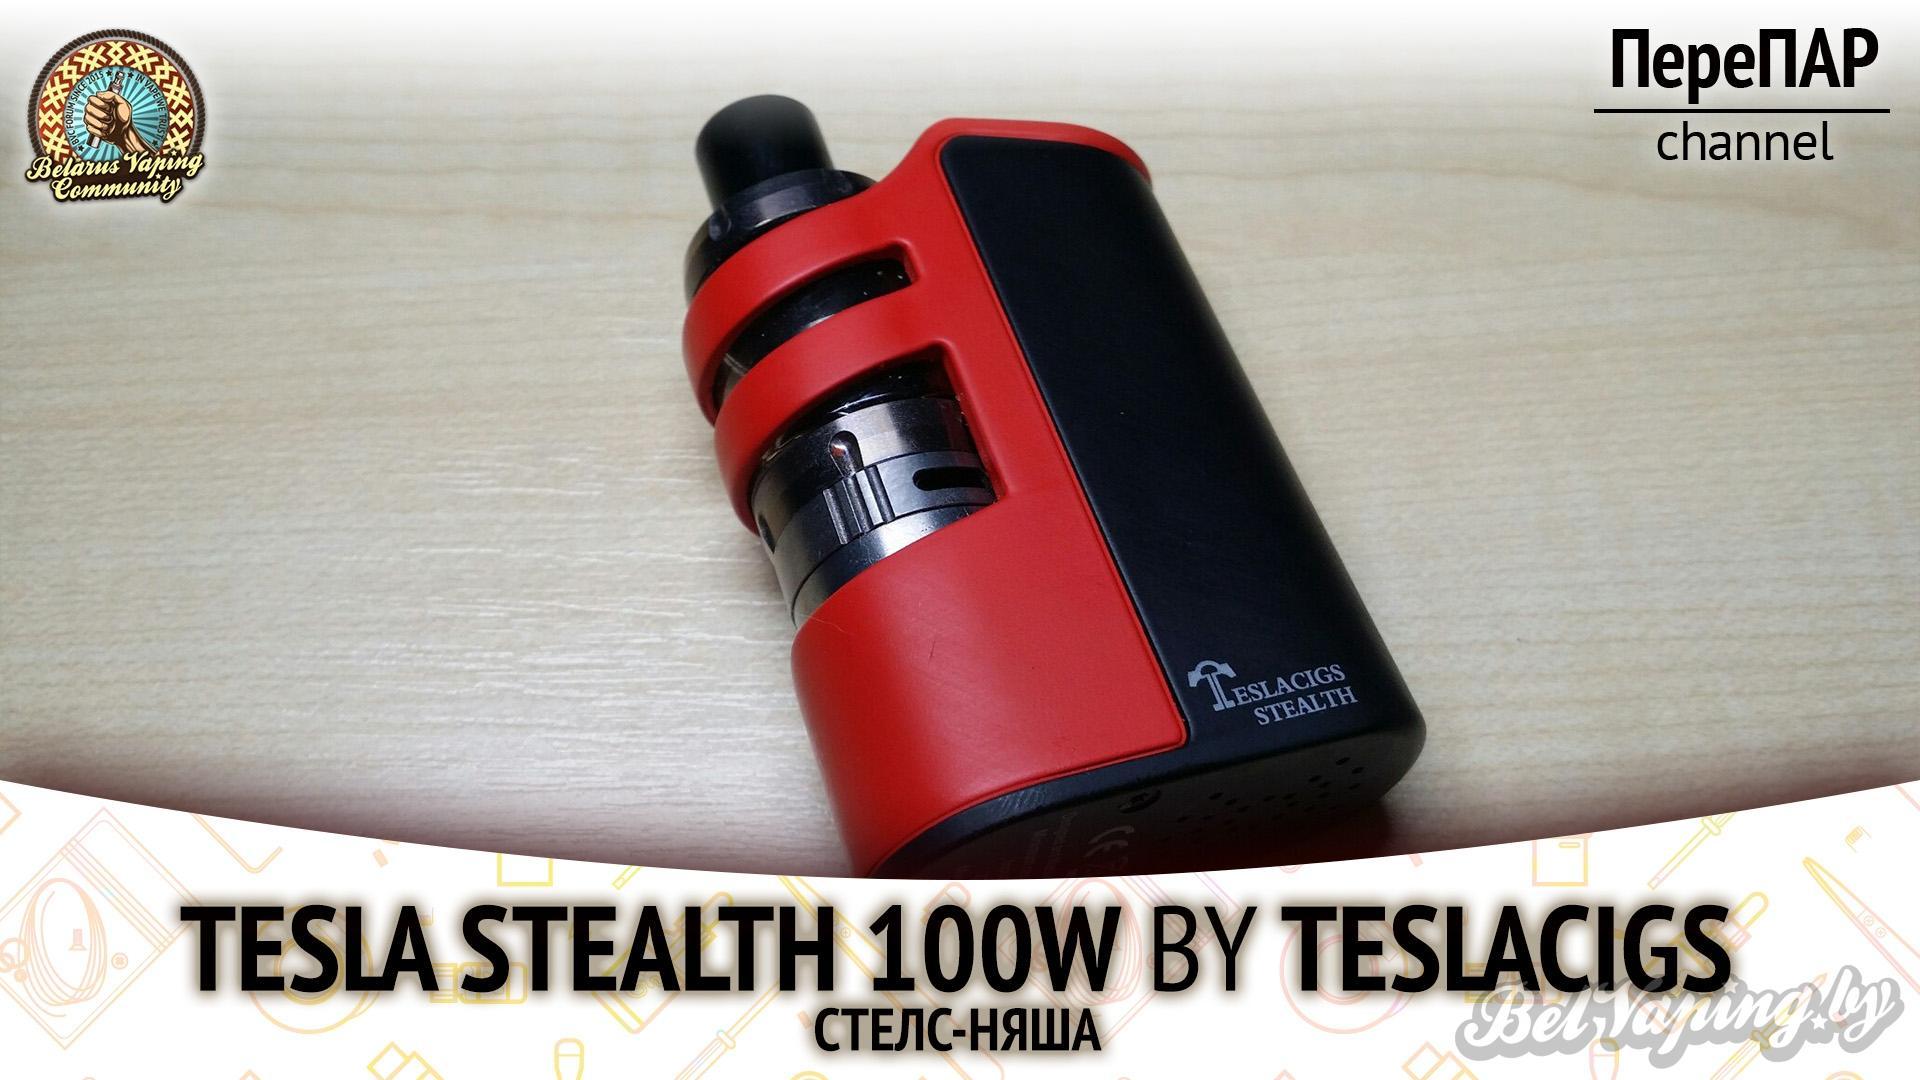 Обзор Tesla Stealth 100w от Teslacigs